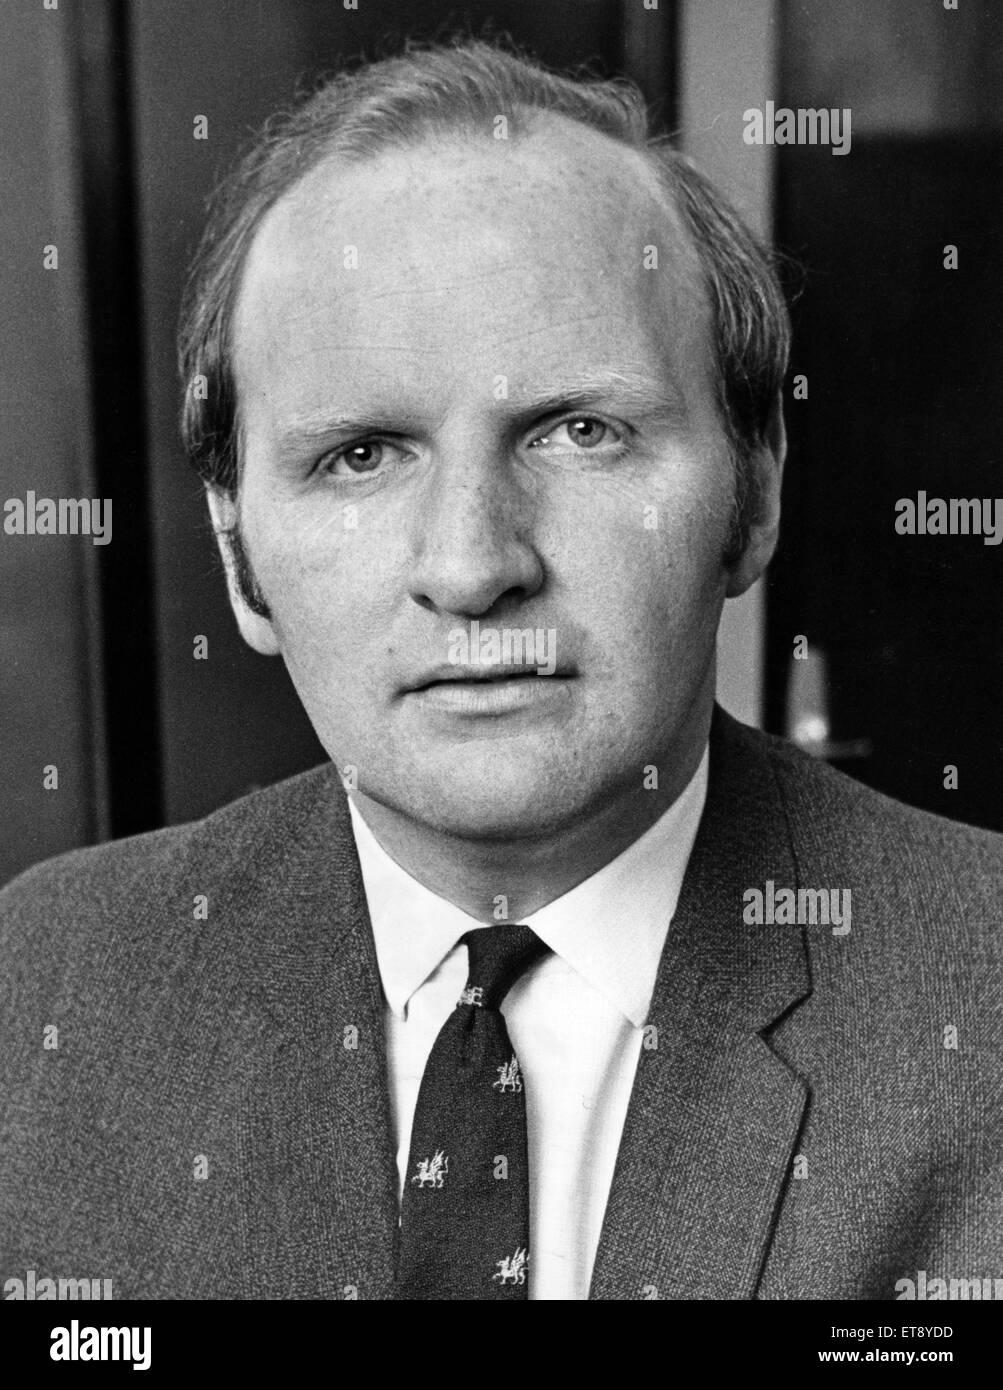 Lyndon Jenkins, Music writer, journalist and member of the Sir Thomas Beecham Society. 25th June 1971. - Stock Image